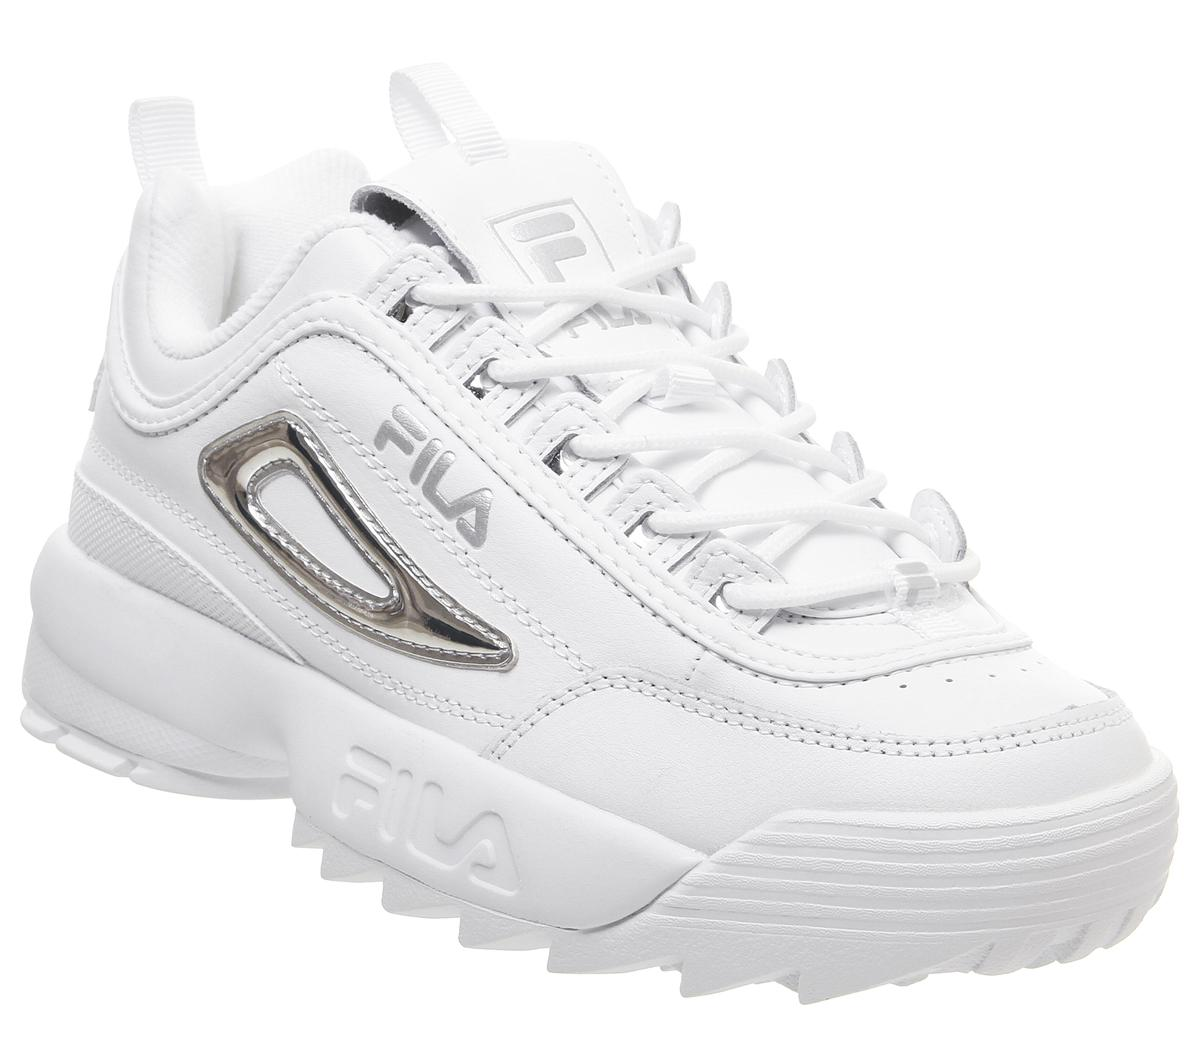 Fila Disruptor II Trainers White White